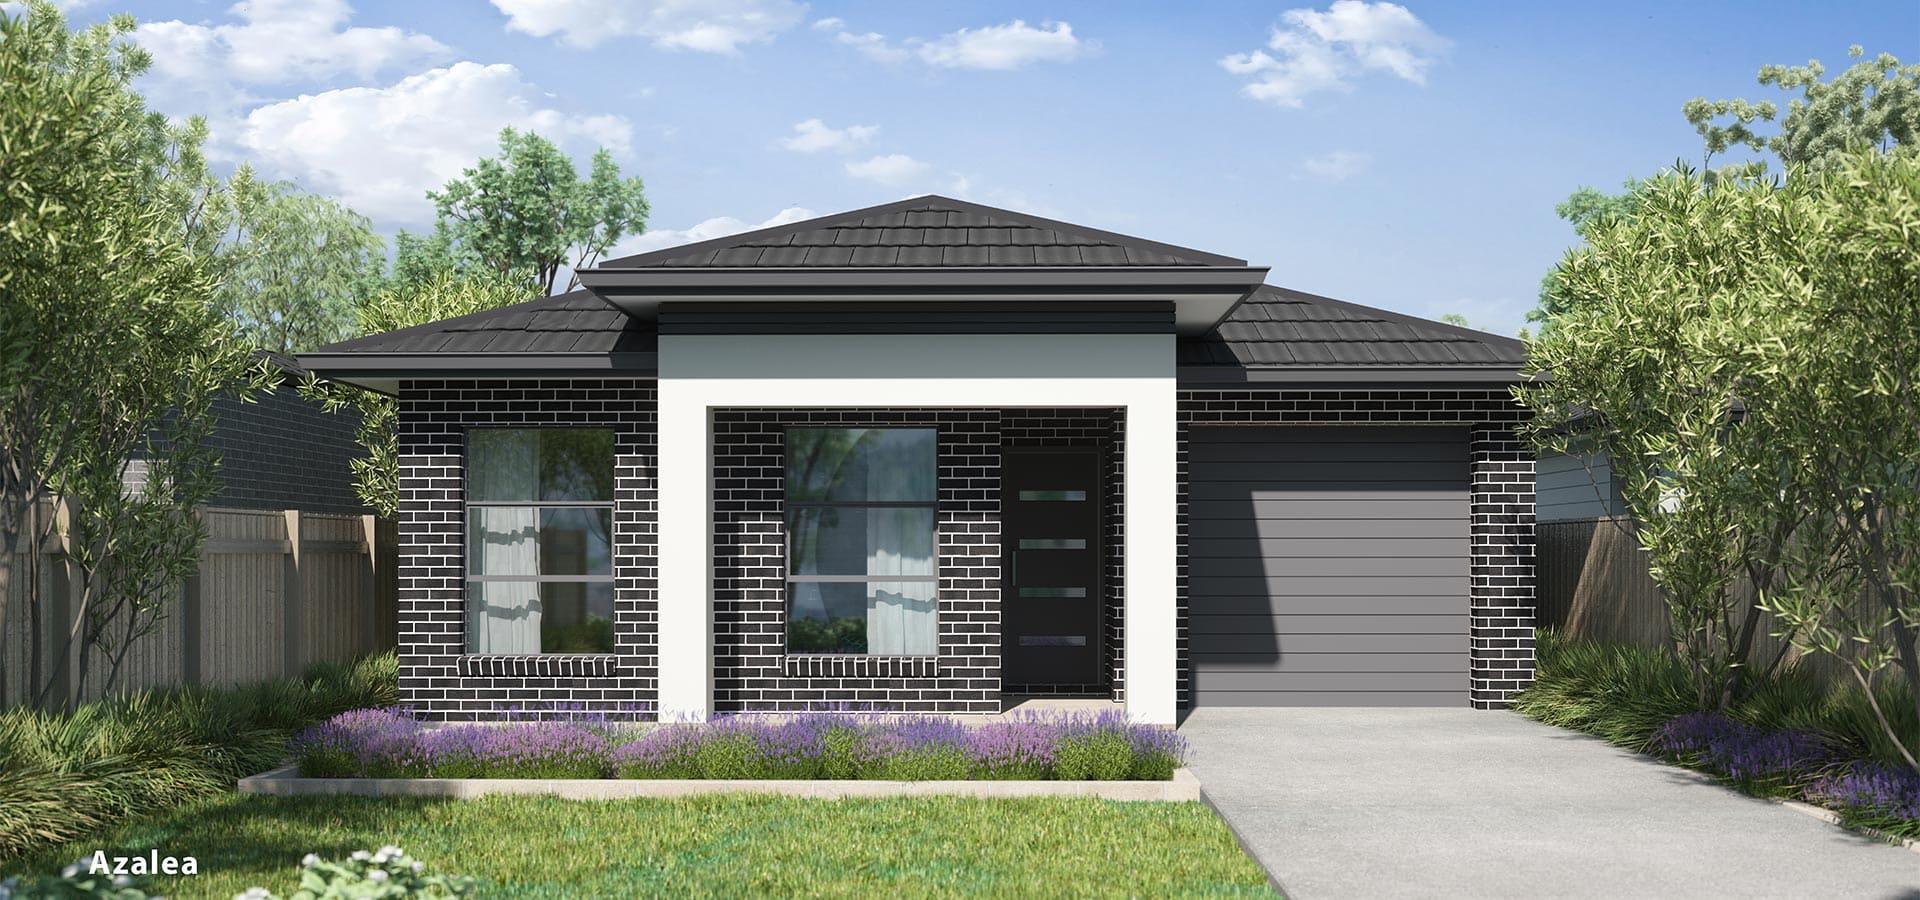 Azalea-10-Single-House-Design